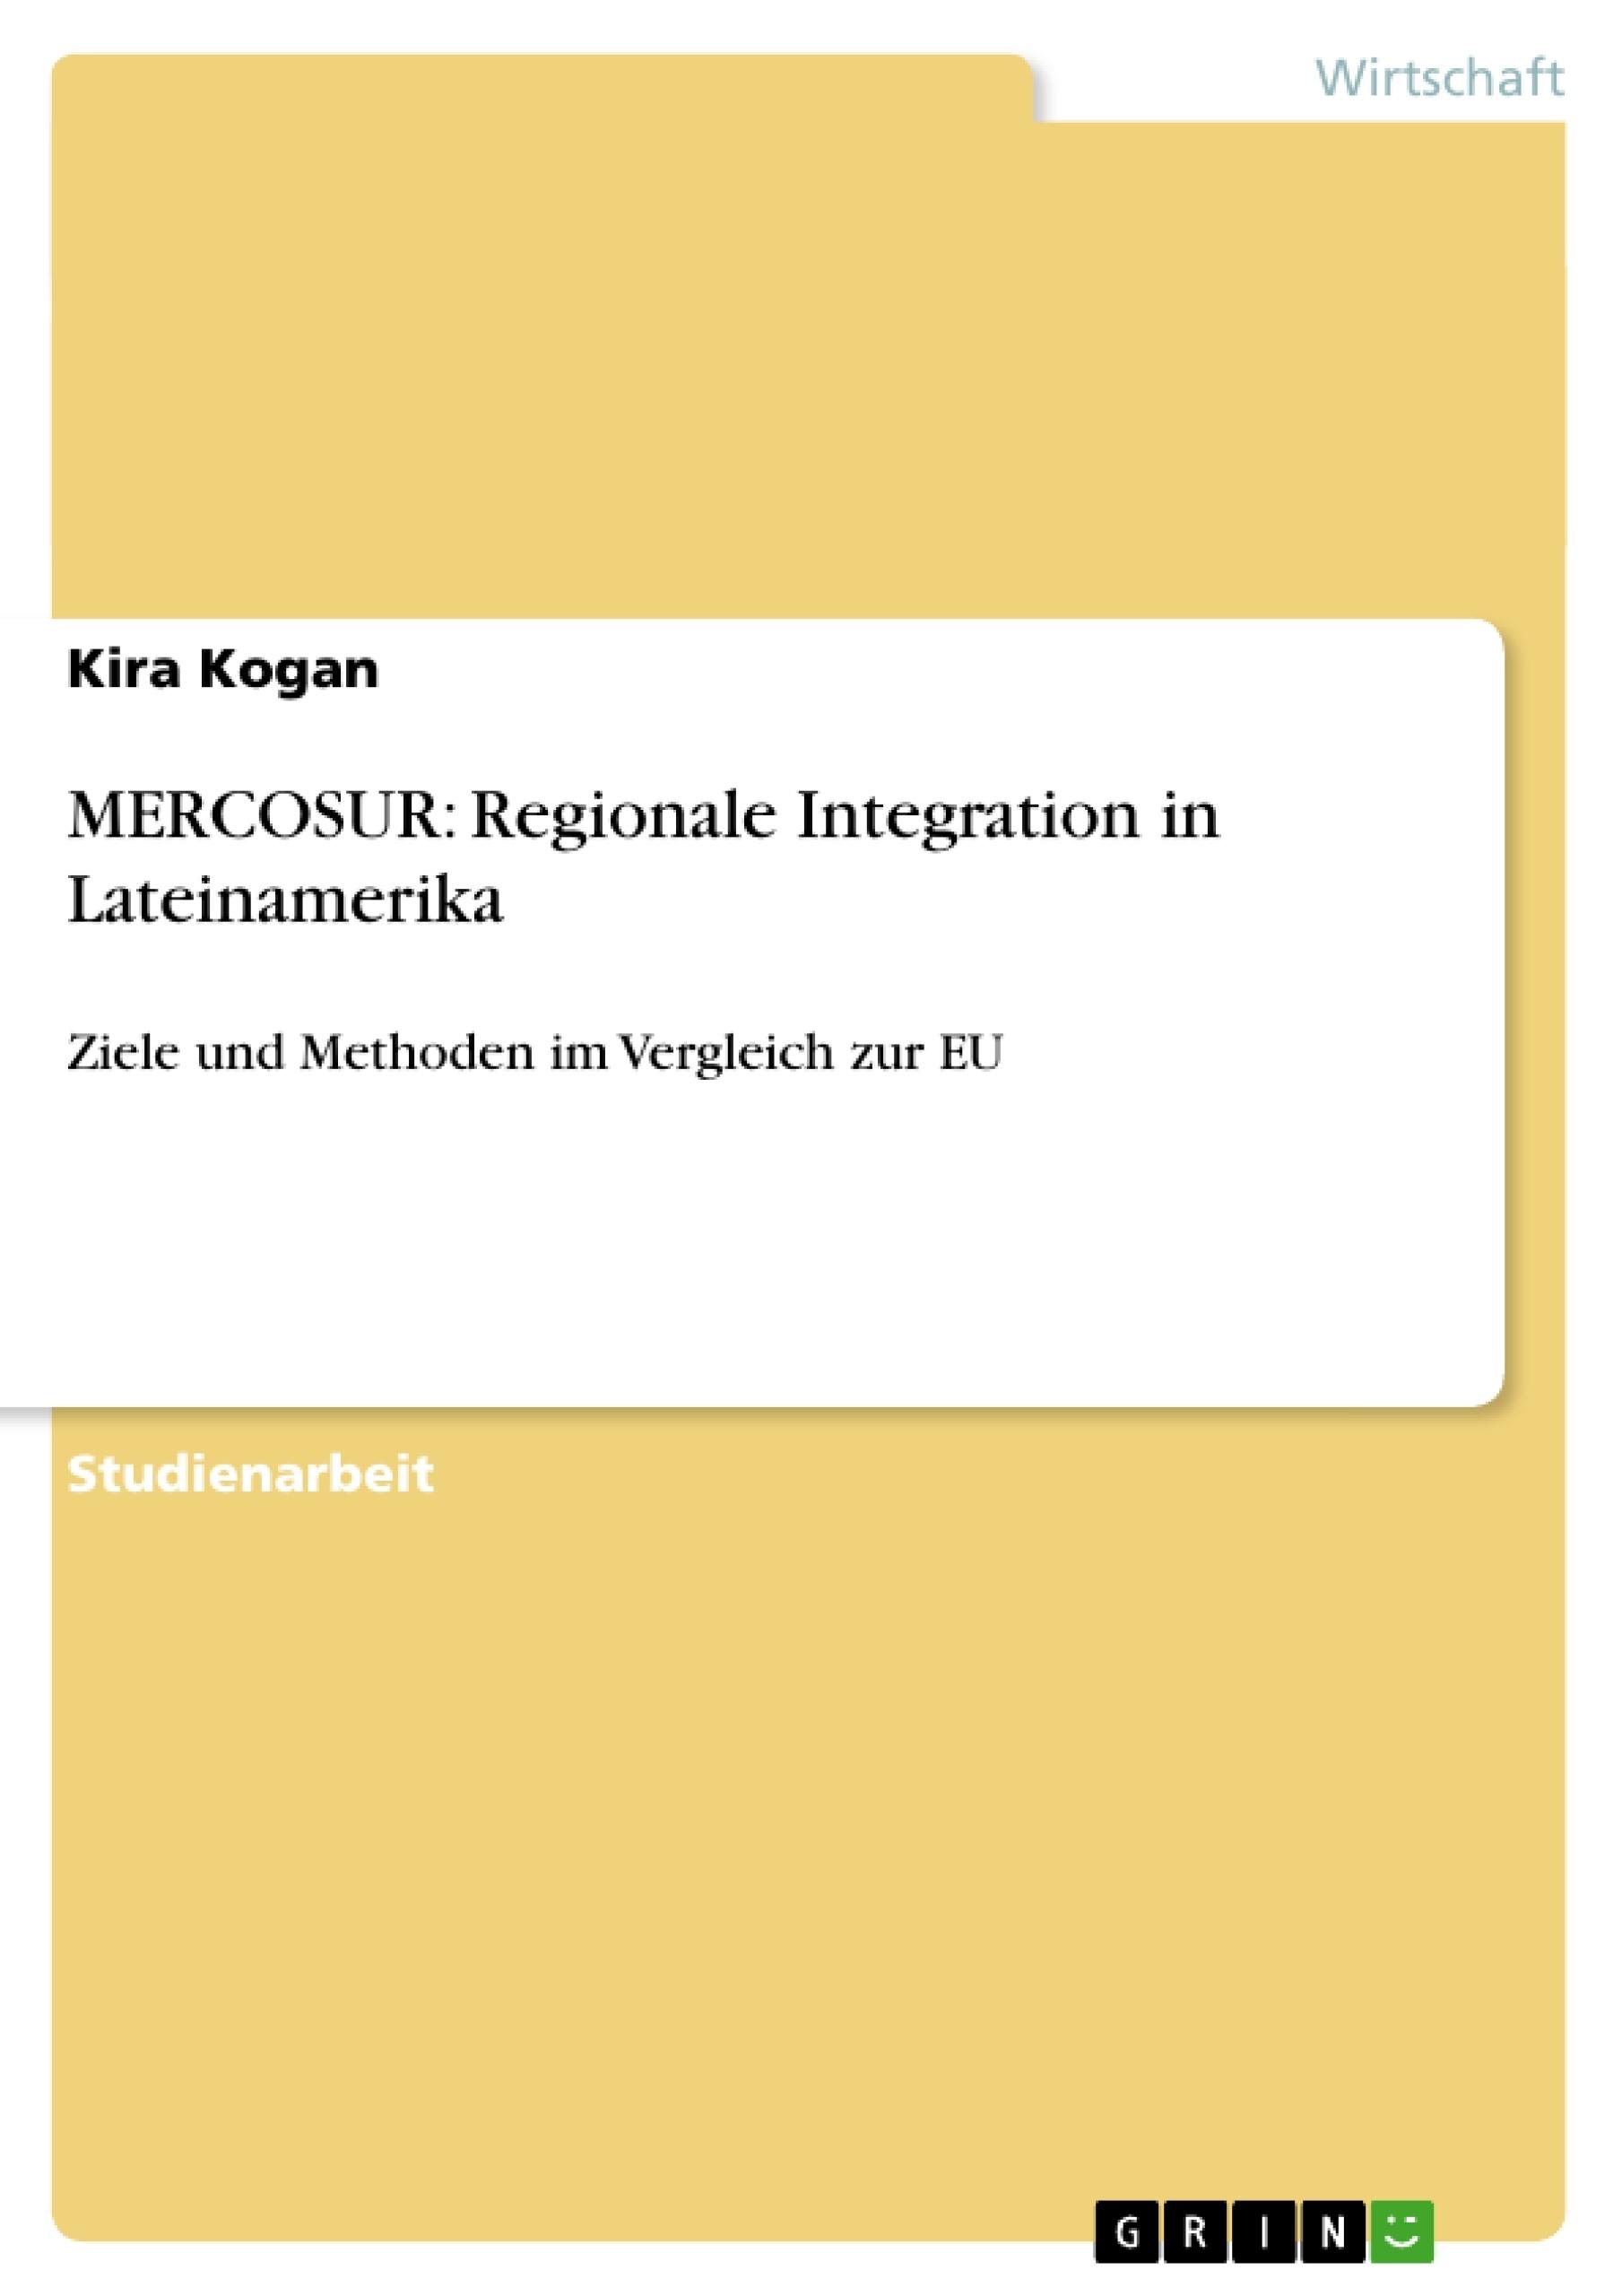 Titel: MERCOSUR: Regionale Integration in Lateinamerika